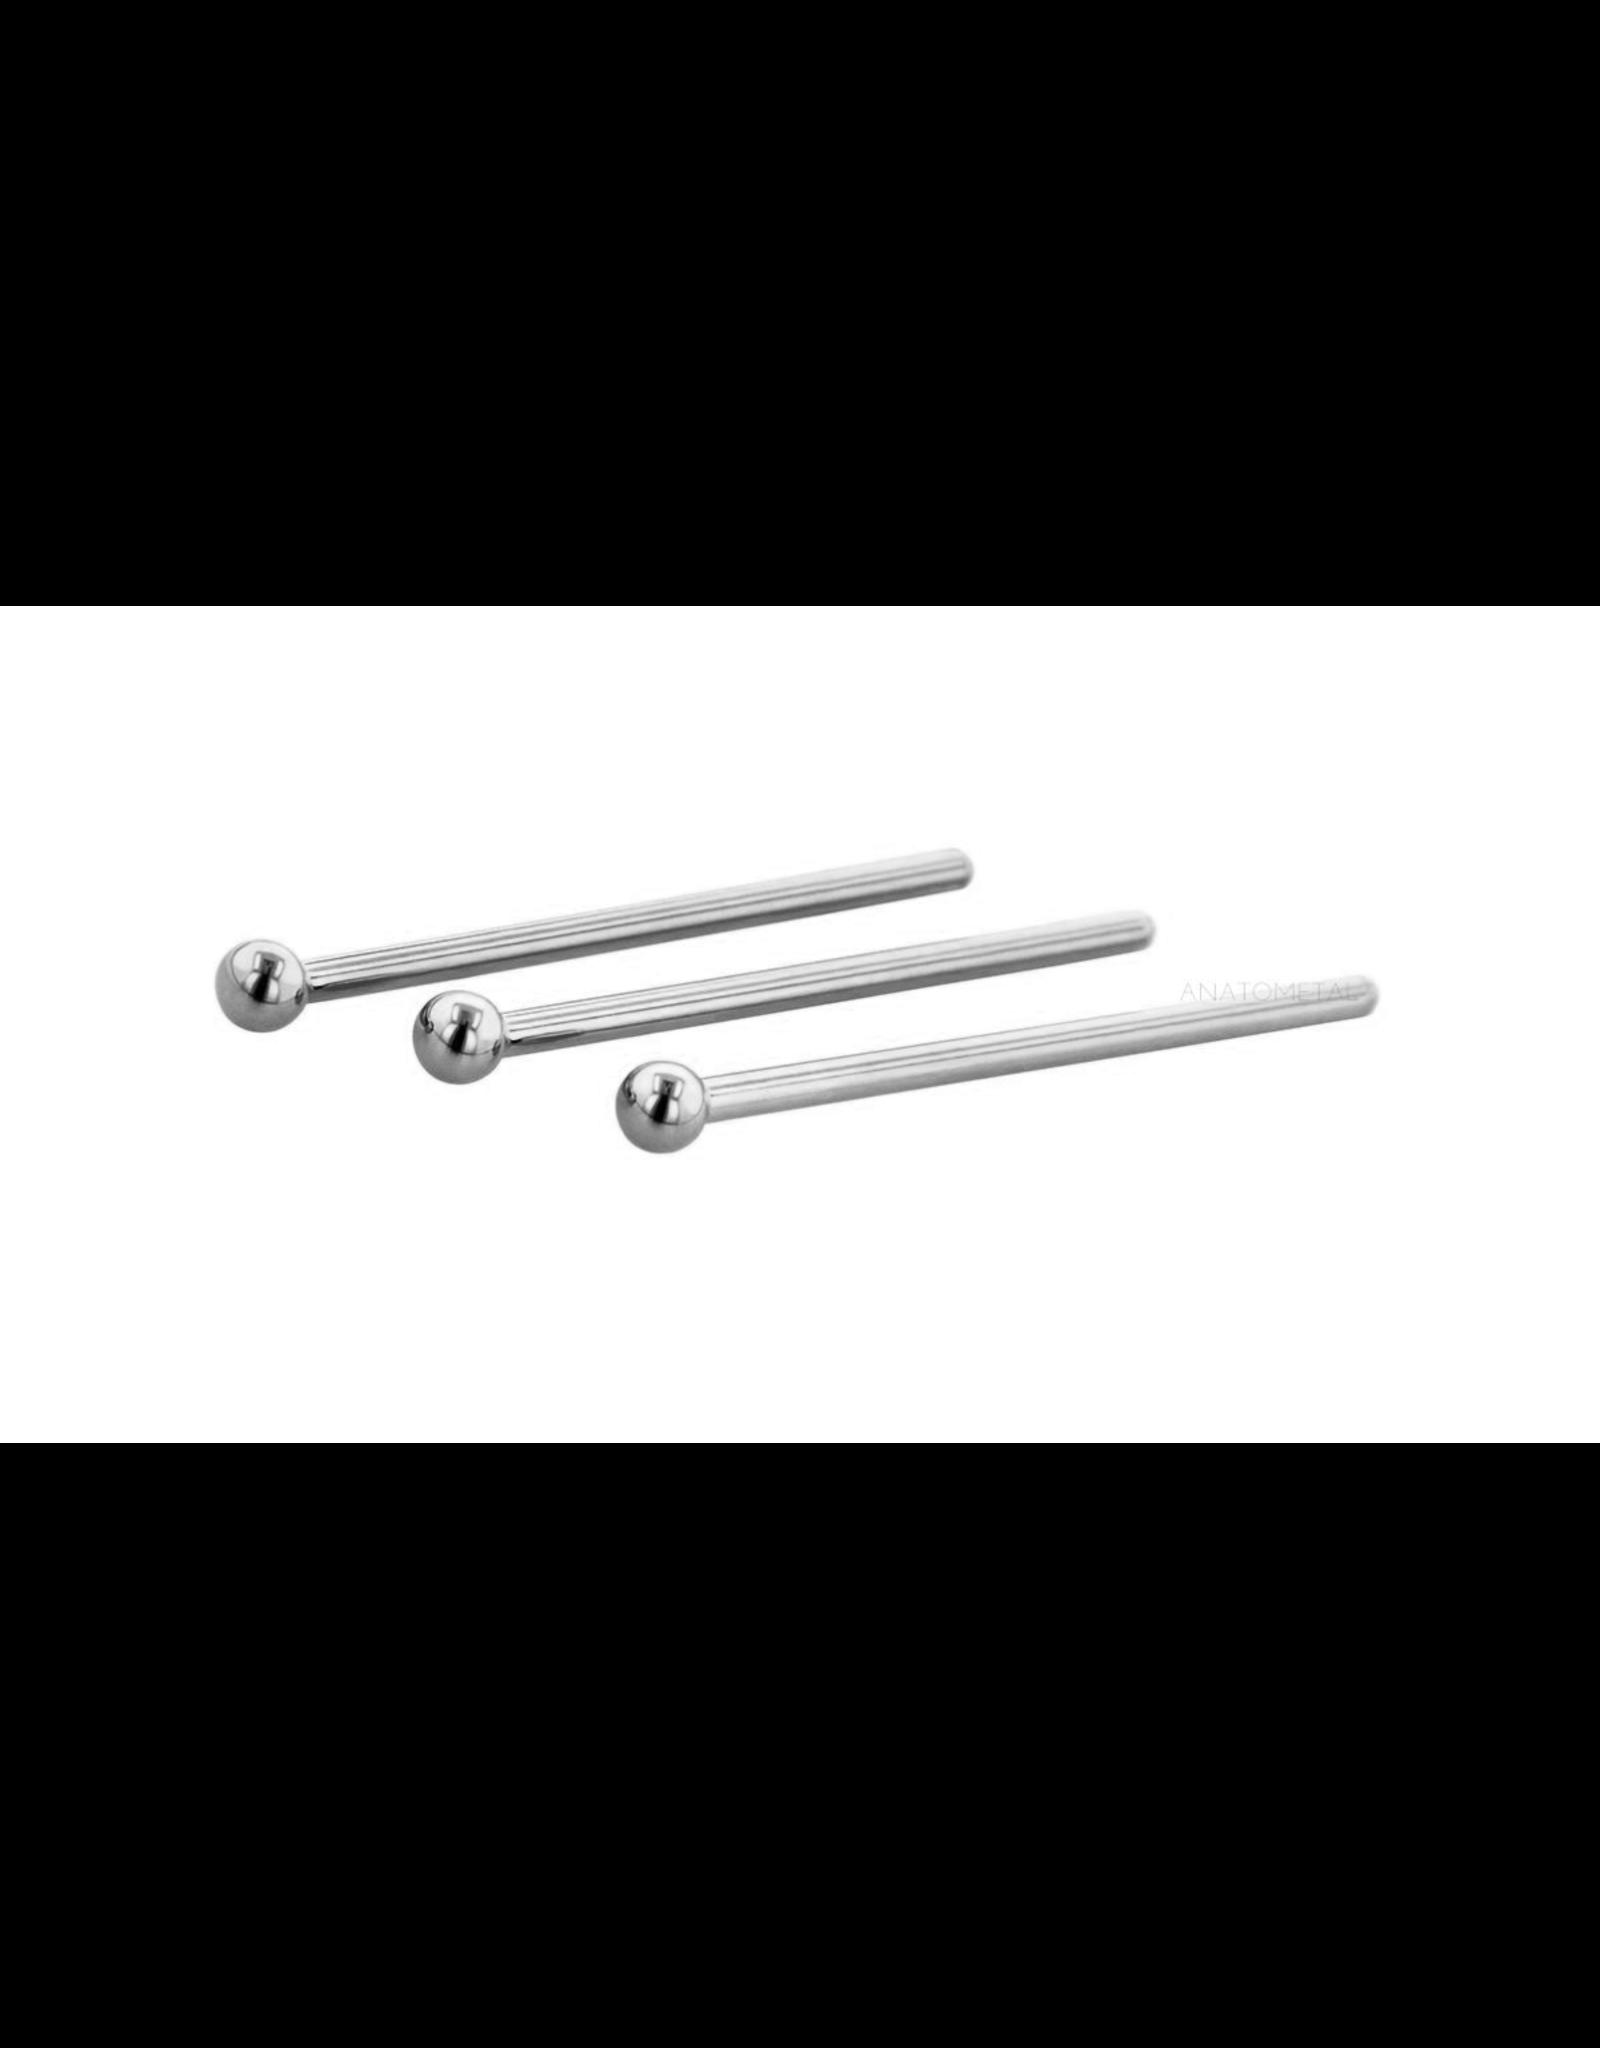 Anatometal 20g Steel Shape Nostril Screw